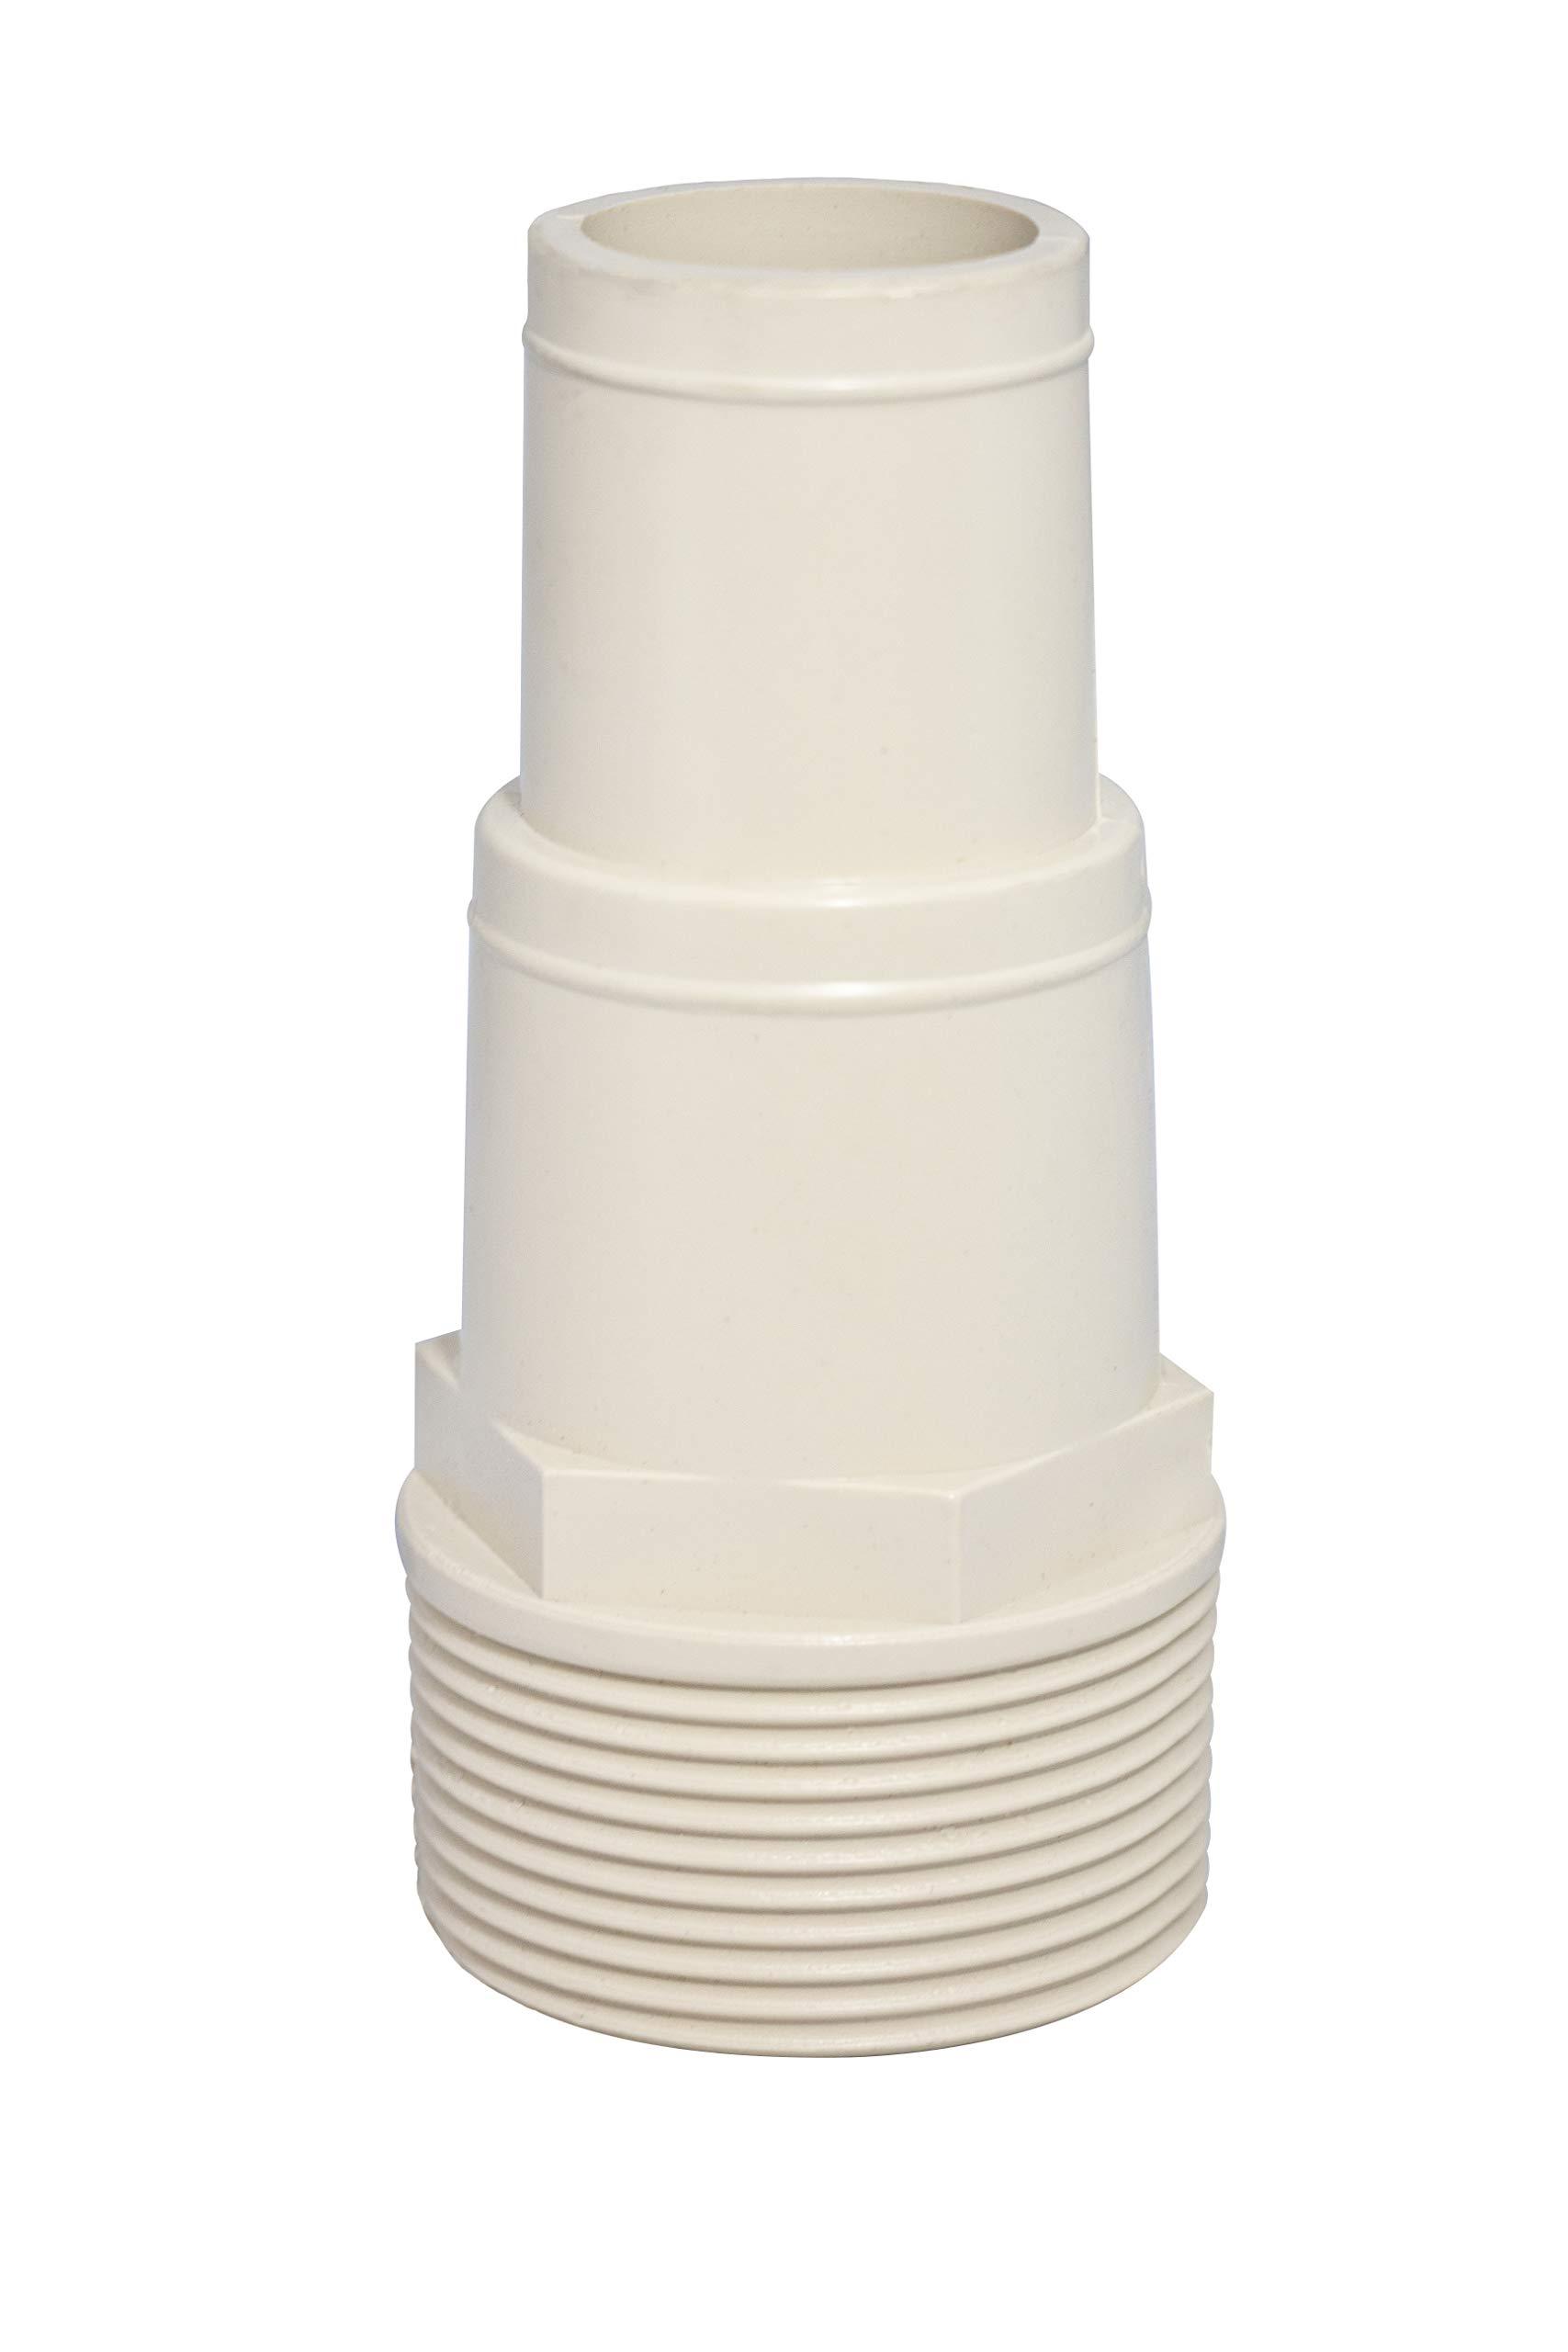 Swimline Hose 1 1 Adapter, White